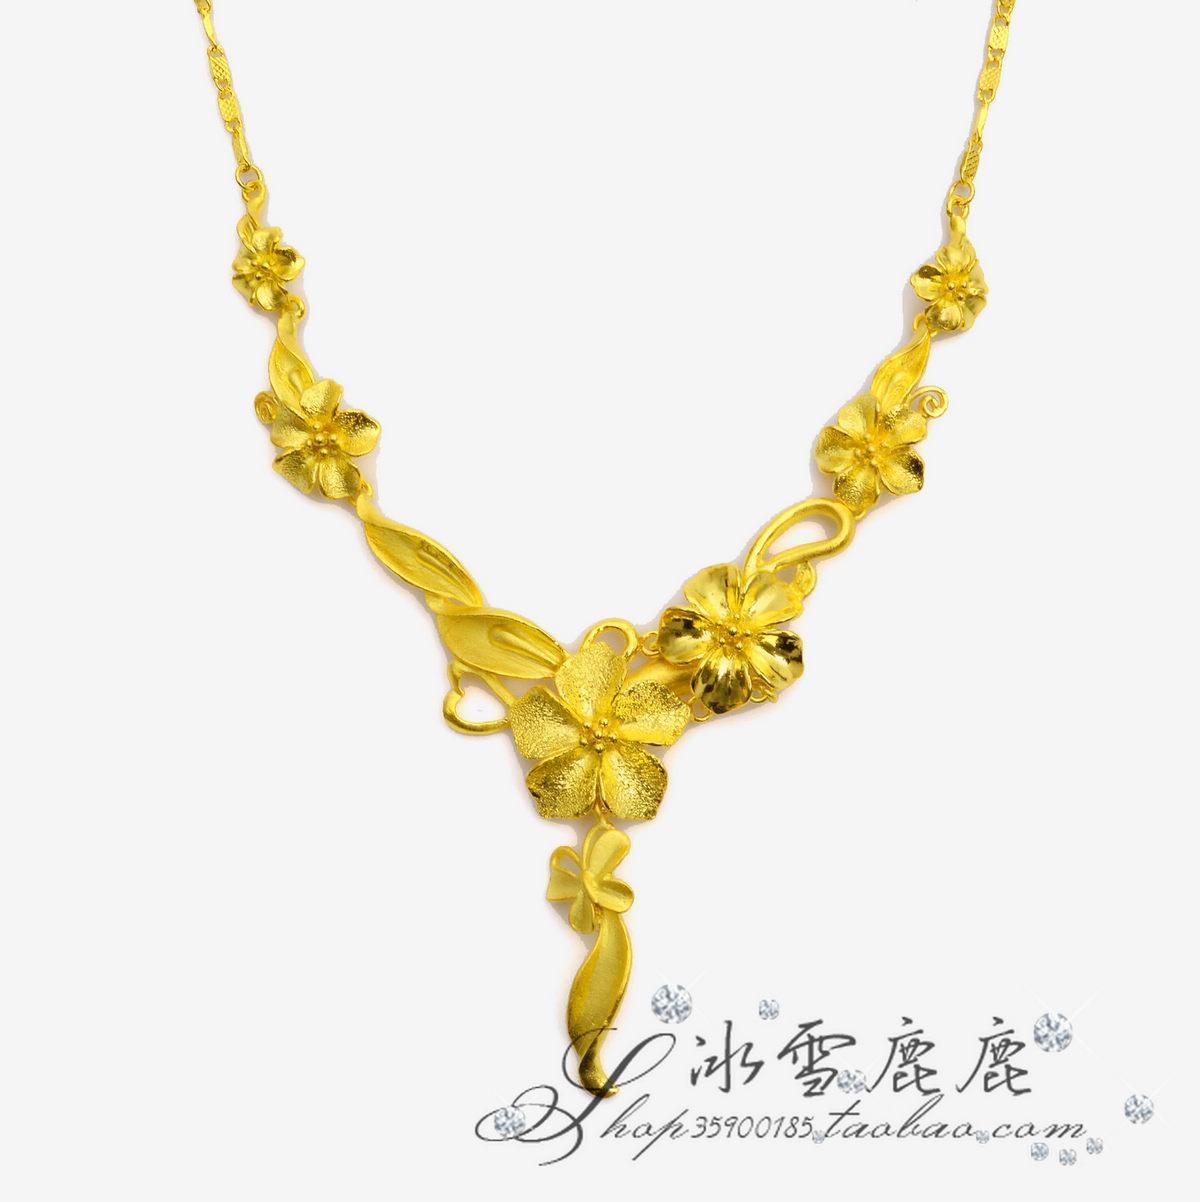 Wholesale 2013 Hong Kong Flower Rich Gold Shop New Models Female ...